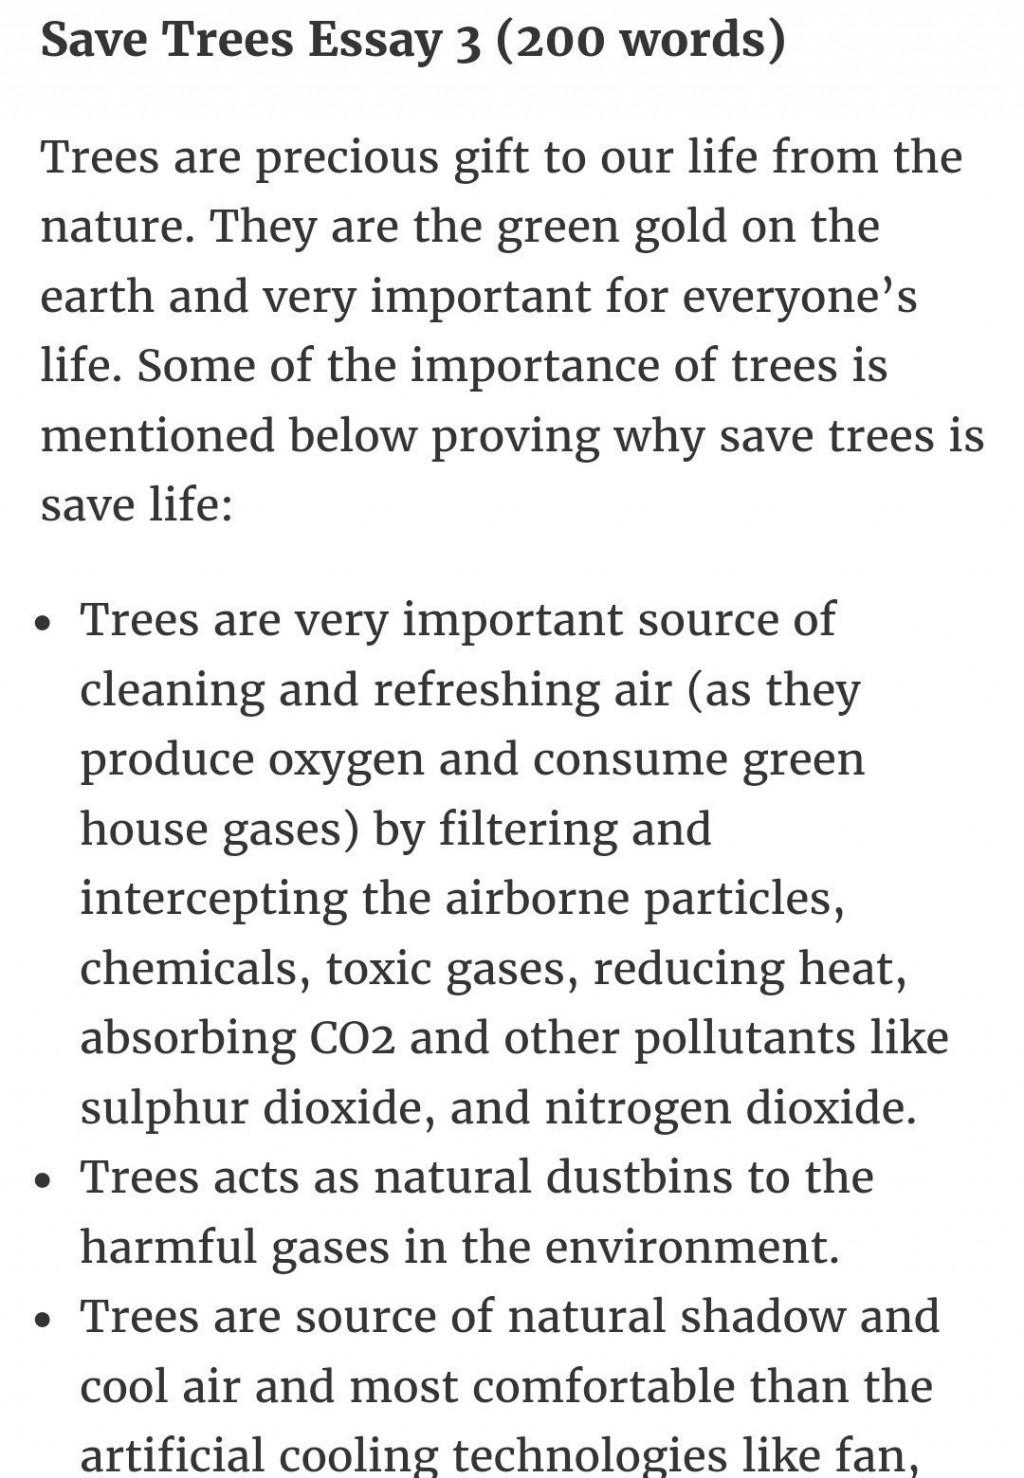 009 Description Of Trees For Essays Essay Striking Large